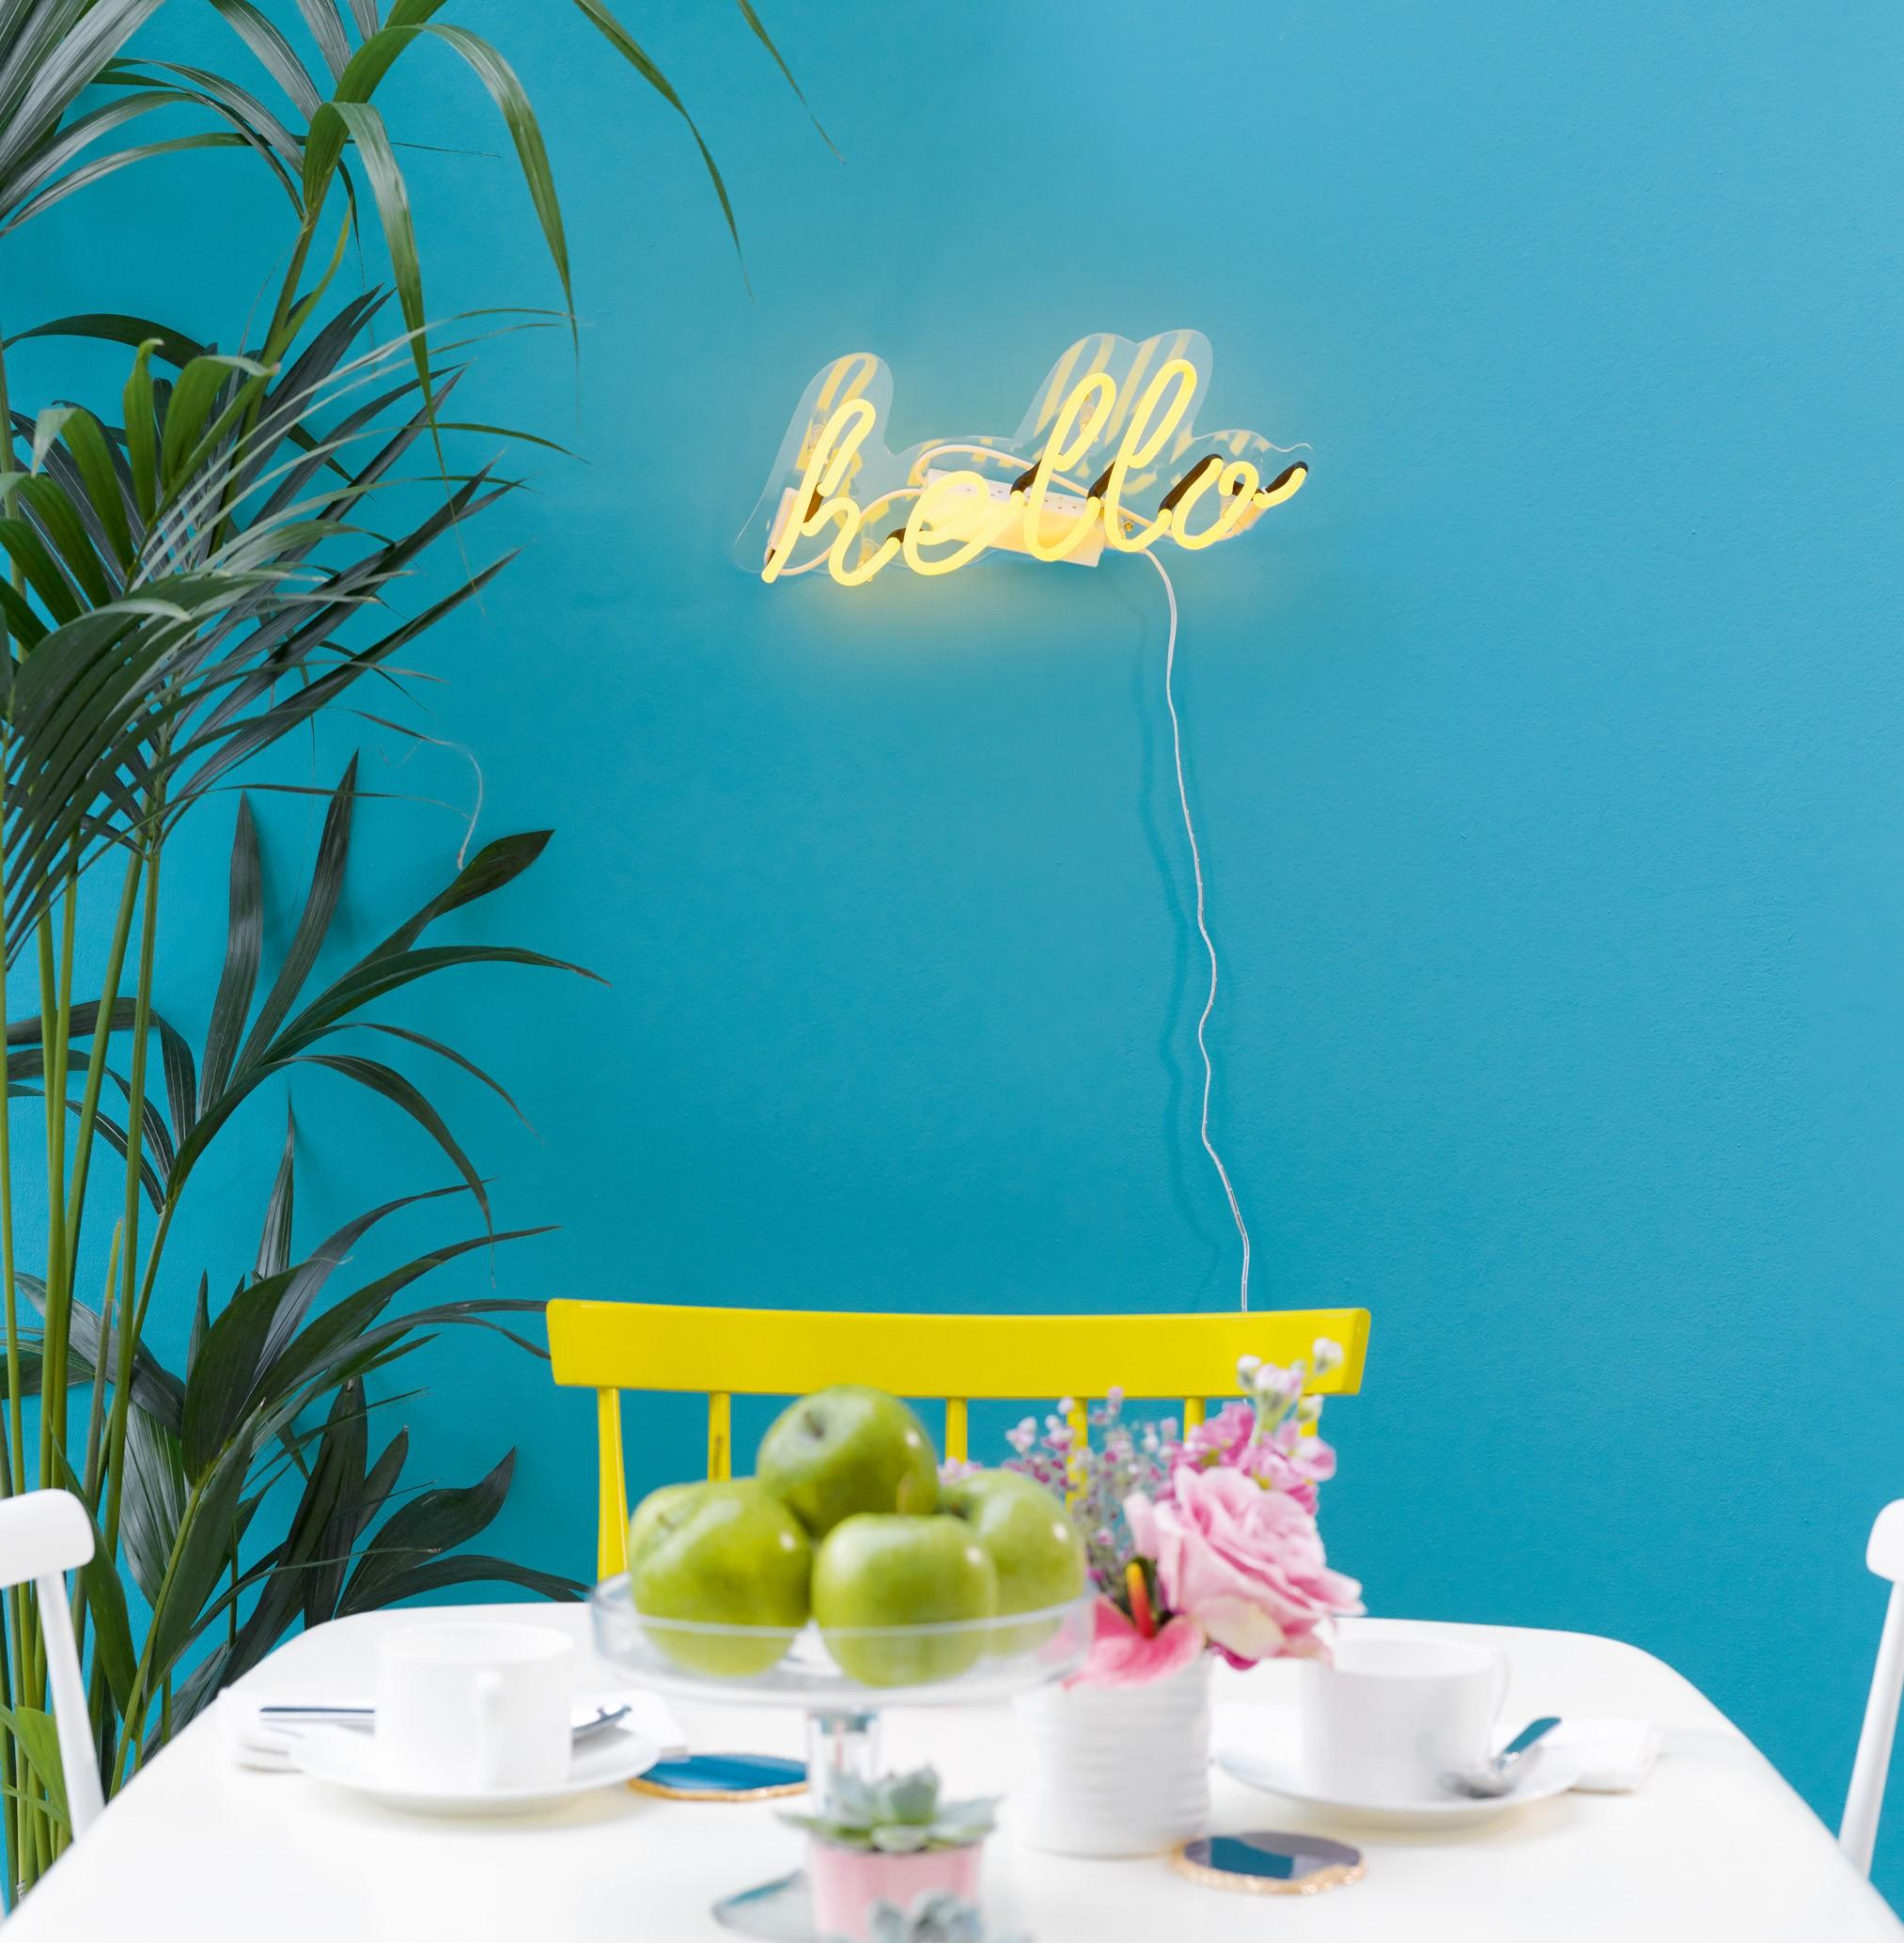 Hurn  Hurn, Neon Hello Wall light in Yellow , 2022508.jpg